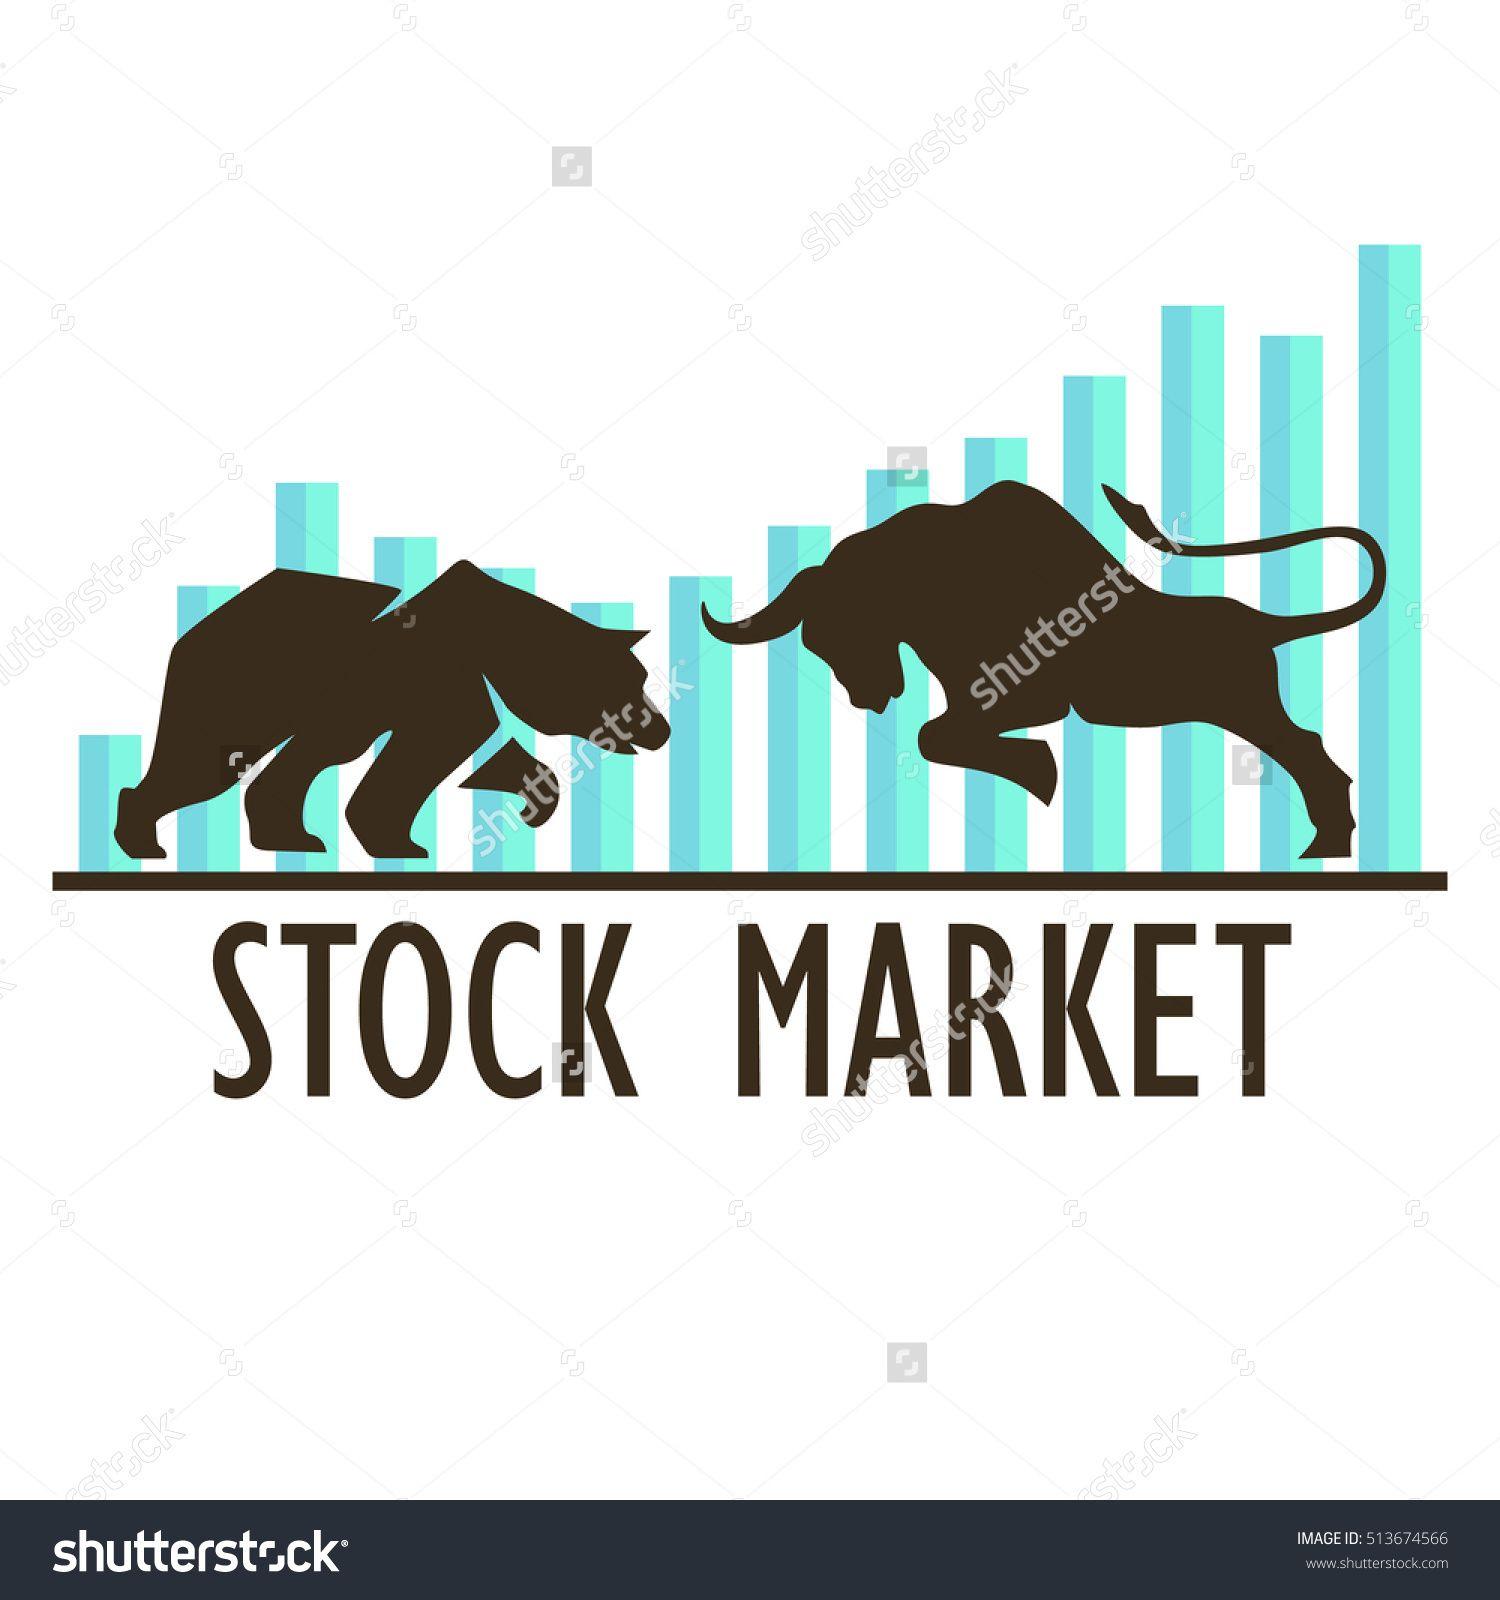 Stock Vector Bullish And Bearish Symbols On Stock Market Vector